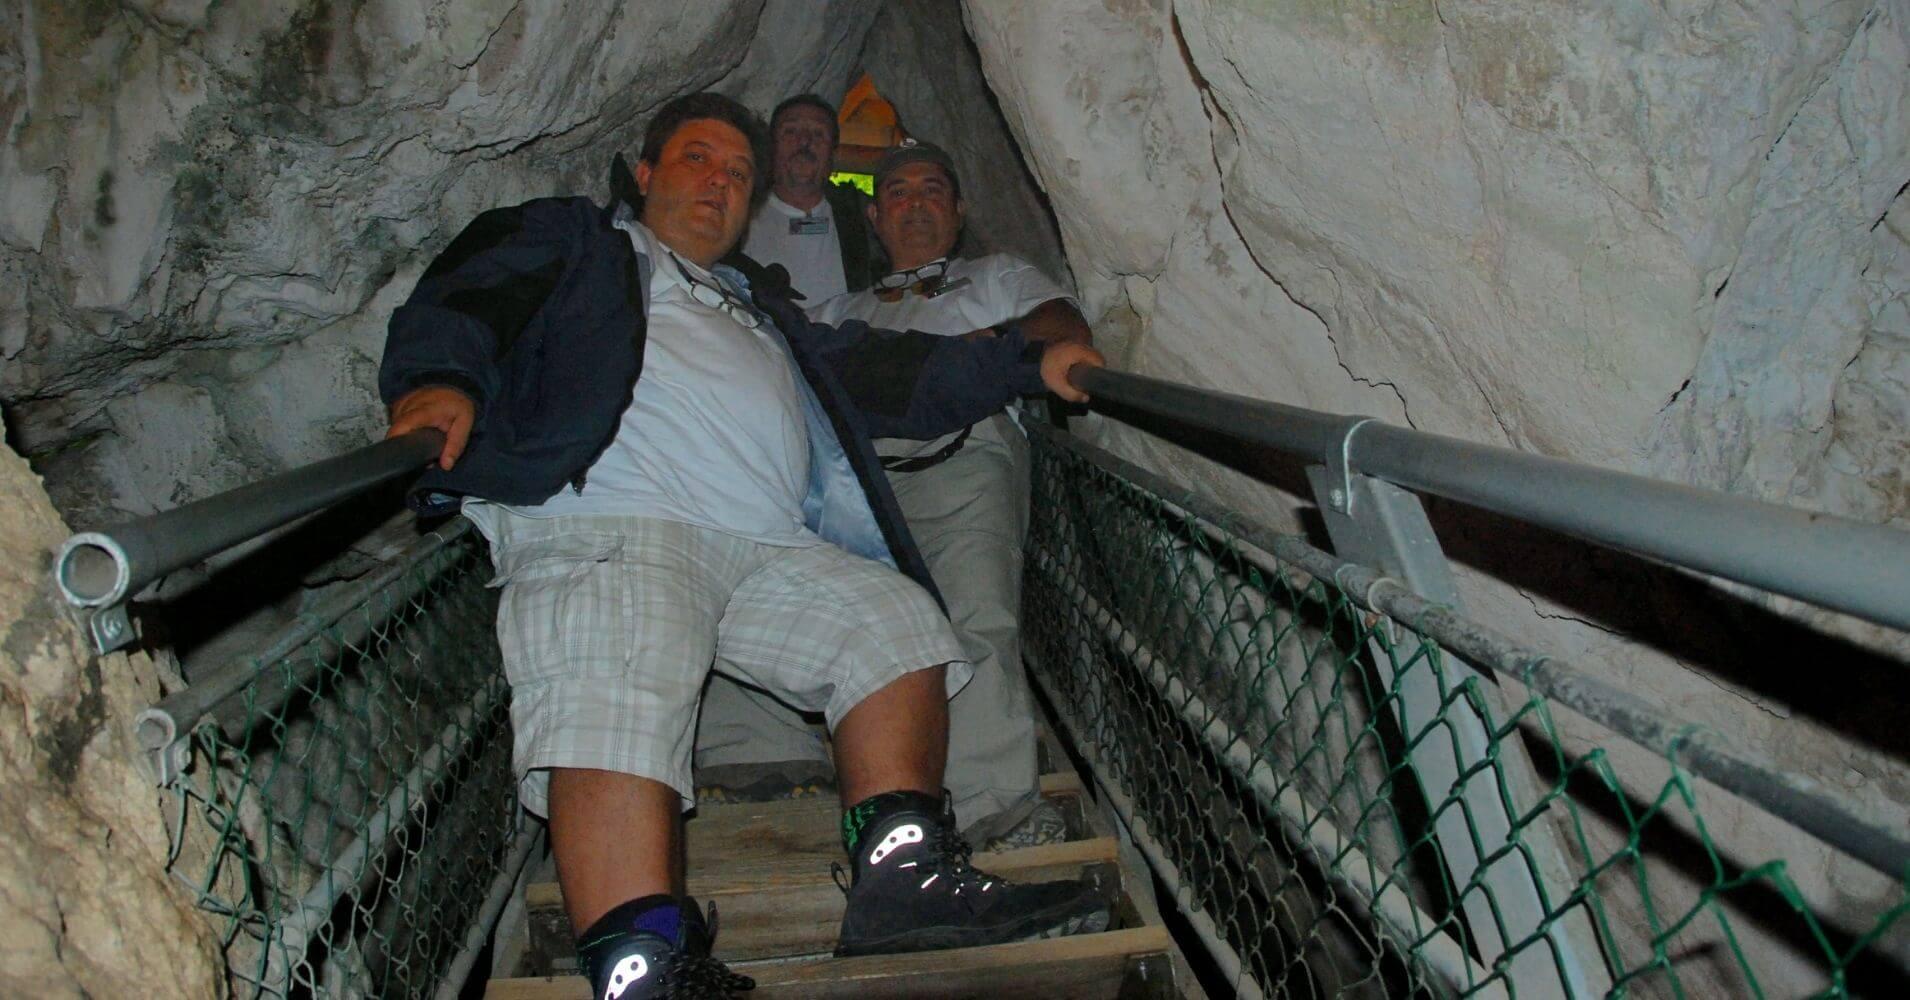 Bajada a las Gorges du Pont du Diable. La Vernaz. Alta Saboya, Auvernia-Ródano-Alpes.